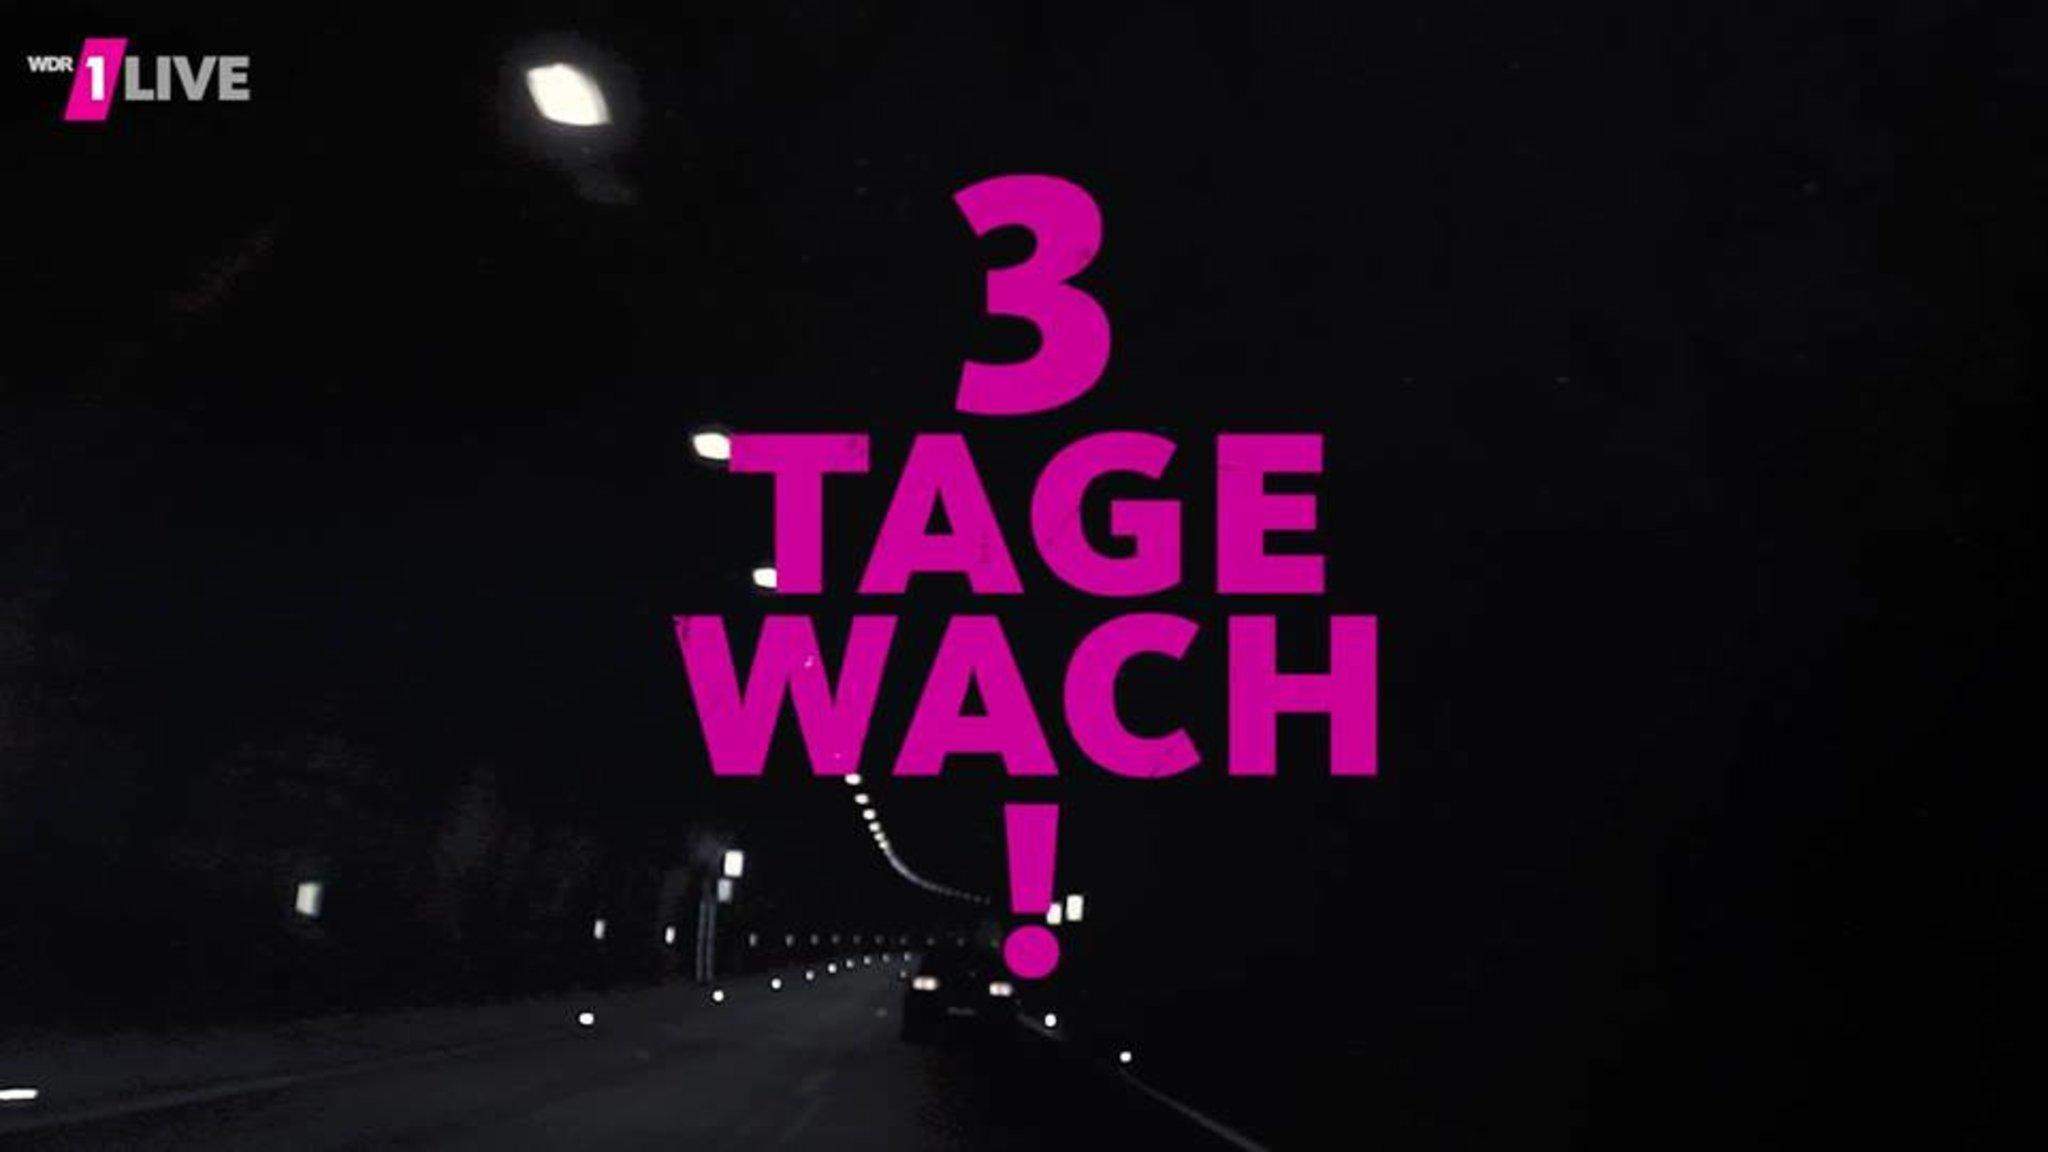 3 Tage Wach